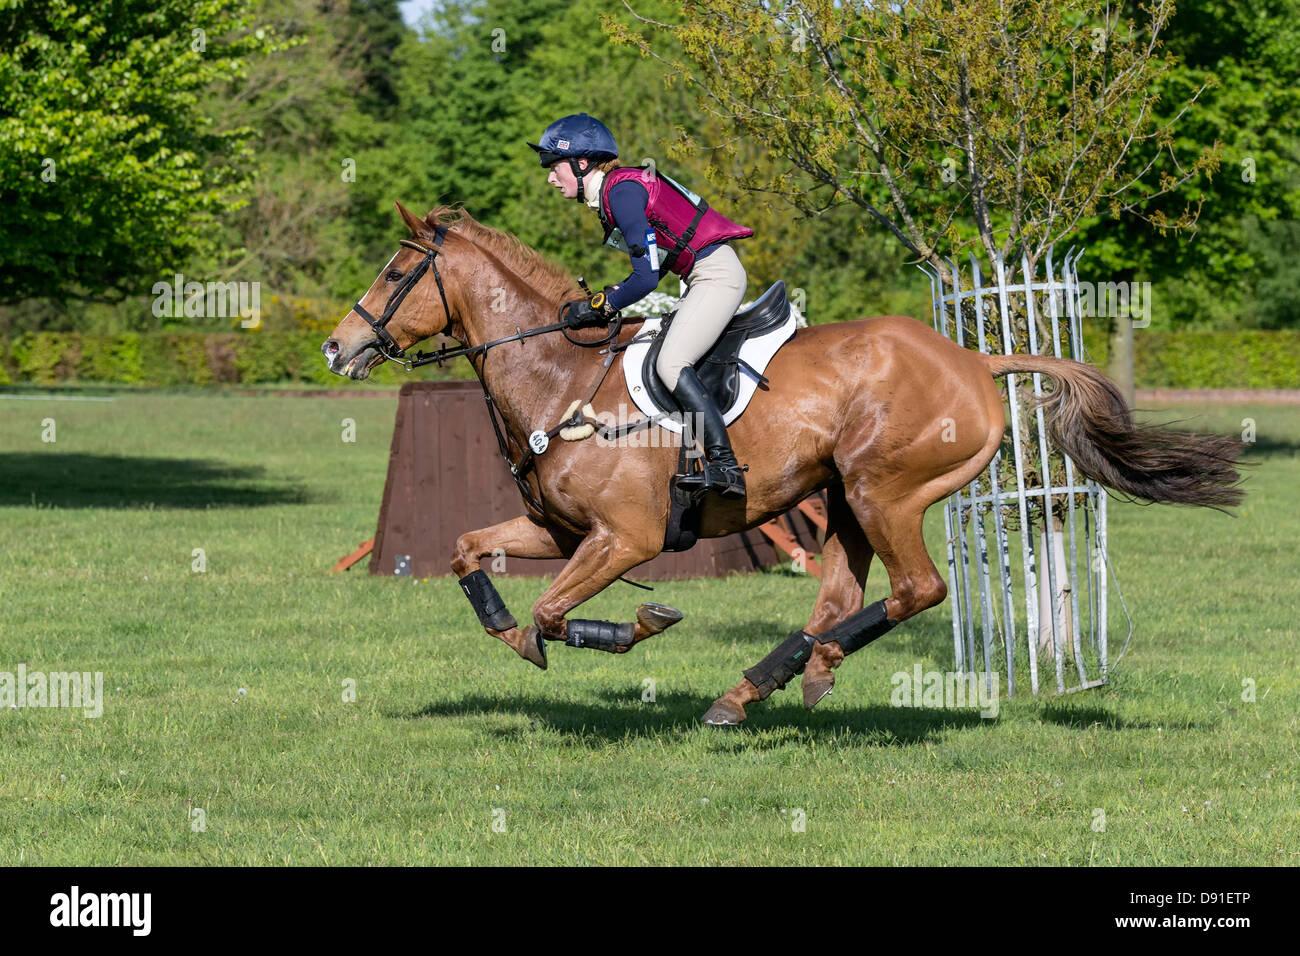 Mary Edmundson on Mr Mystery Man - Houghton International Horse Trials 2013 - Stock Image